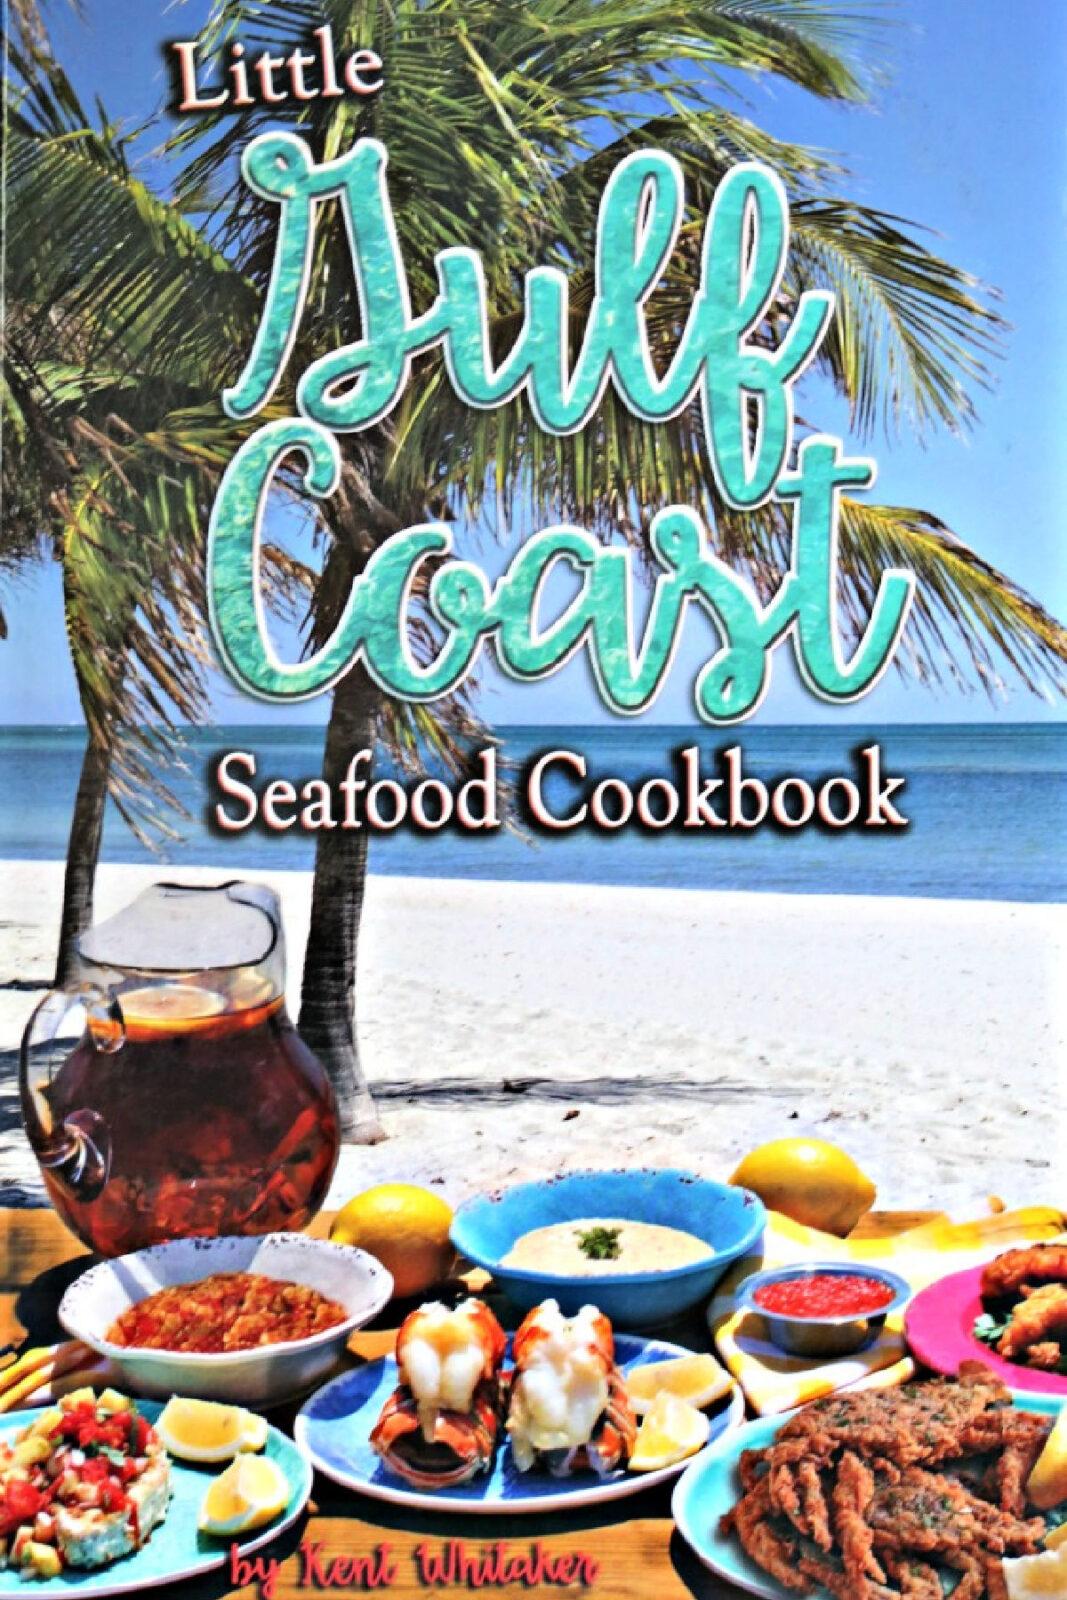 Little Gulf Coast Seafood Cookbook cover.